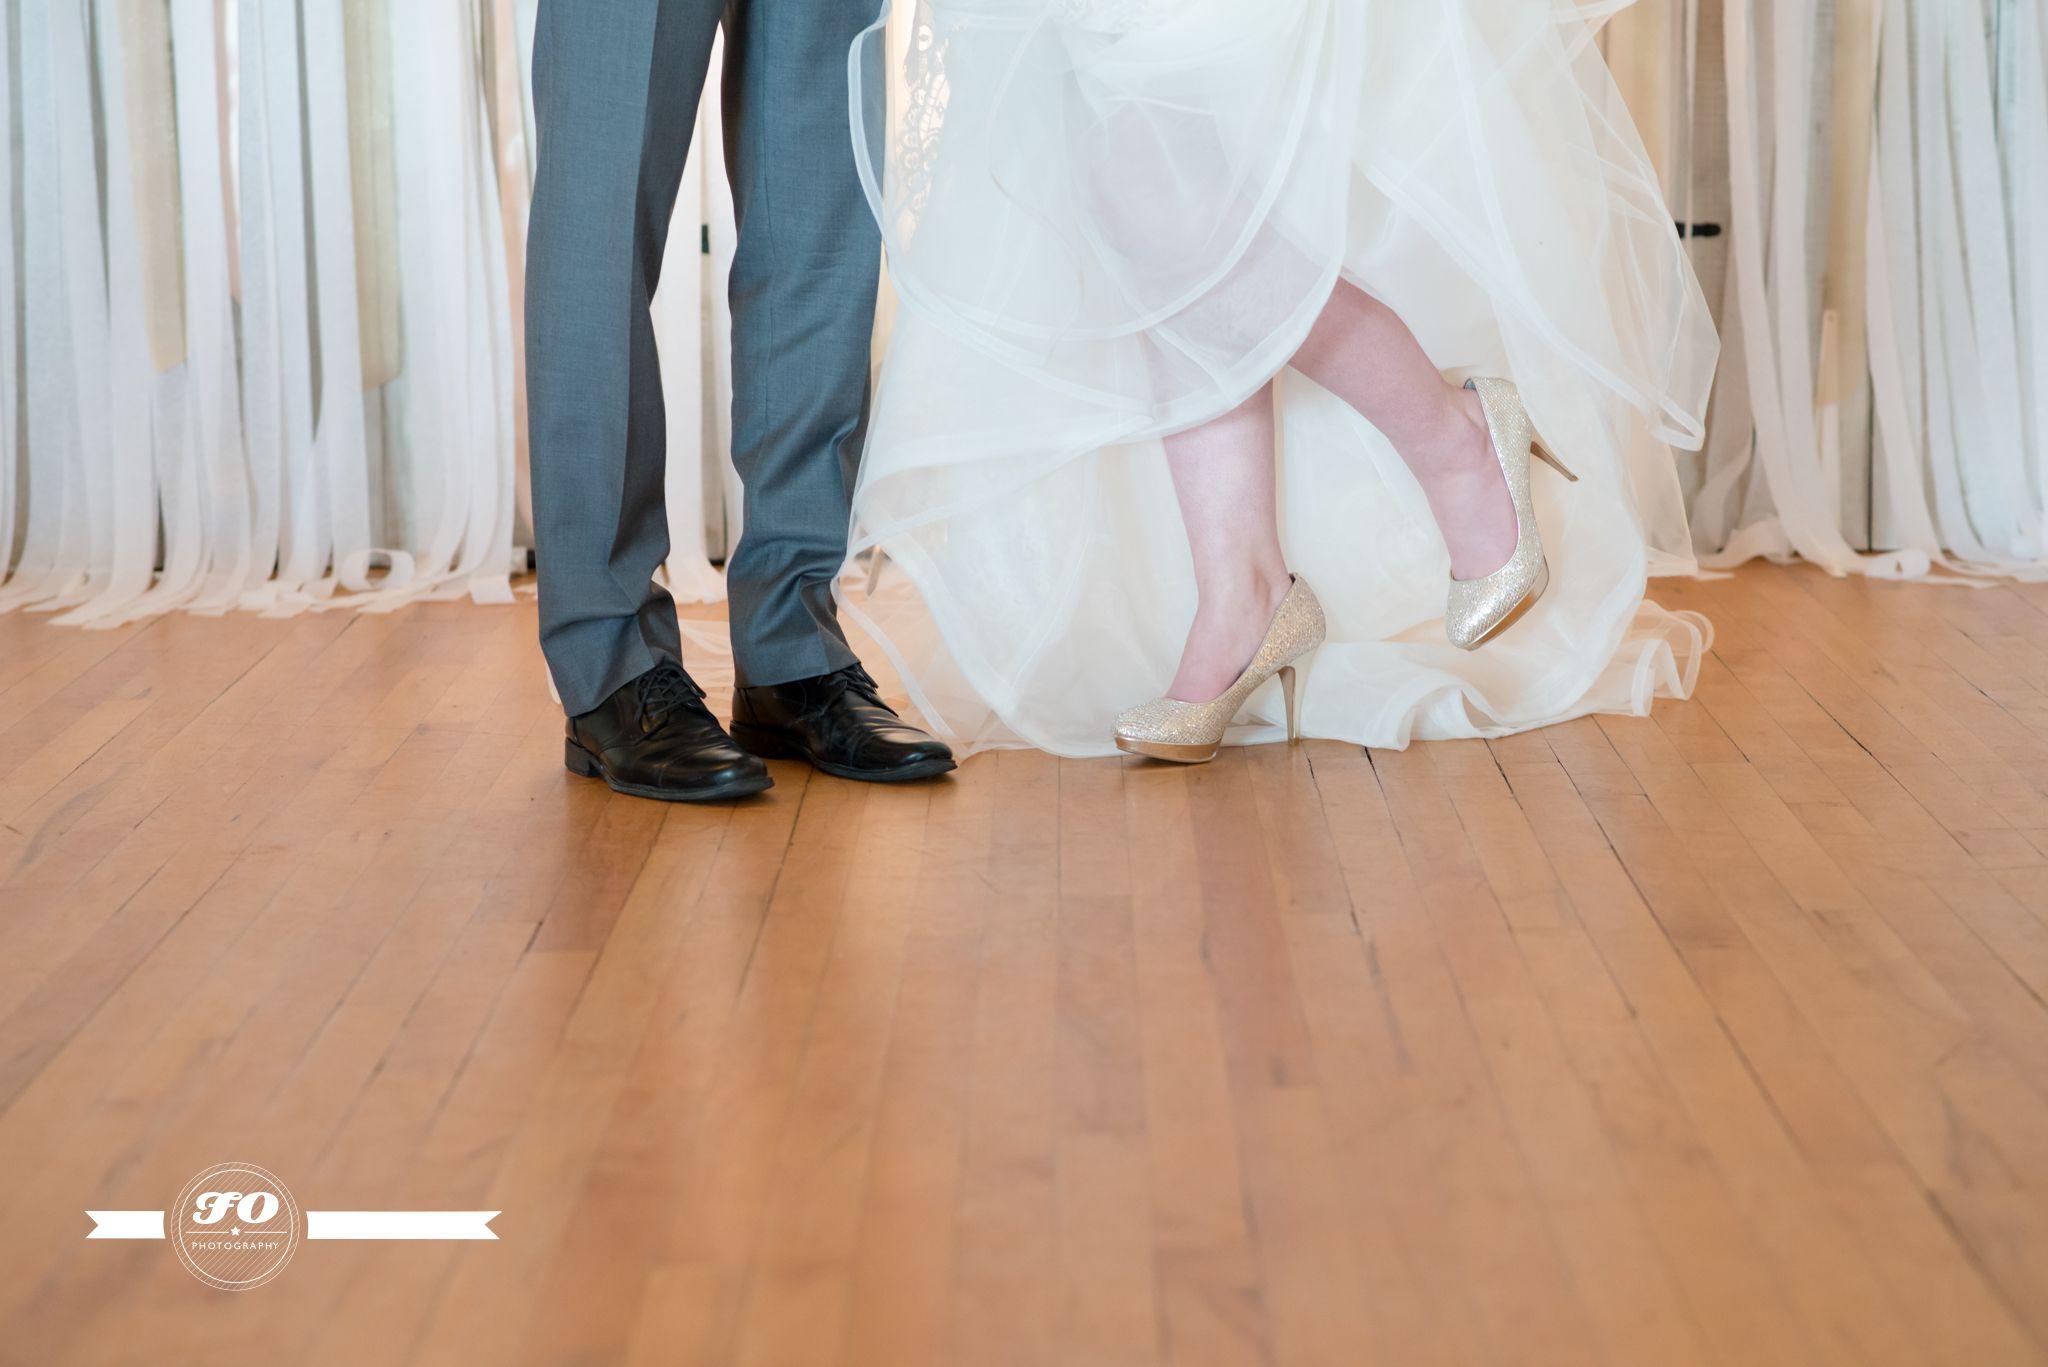 www.fophotography.com/blog/edmonton-spring-wedding-inspiration/?utm_source=pinterest.com&utm_medium=referral&utm_campaign=official+pinterest+page